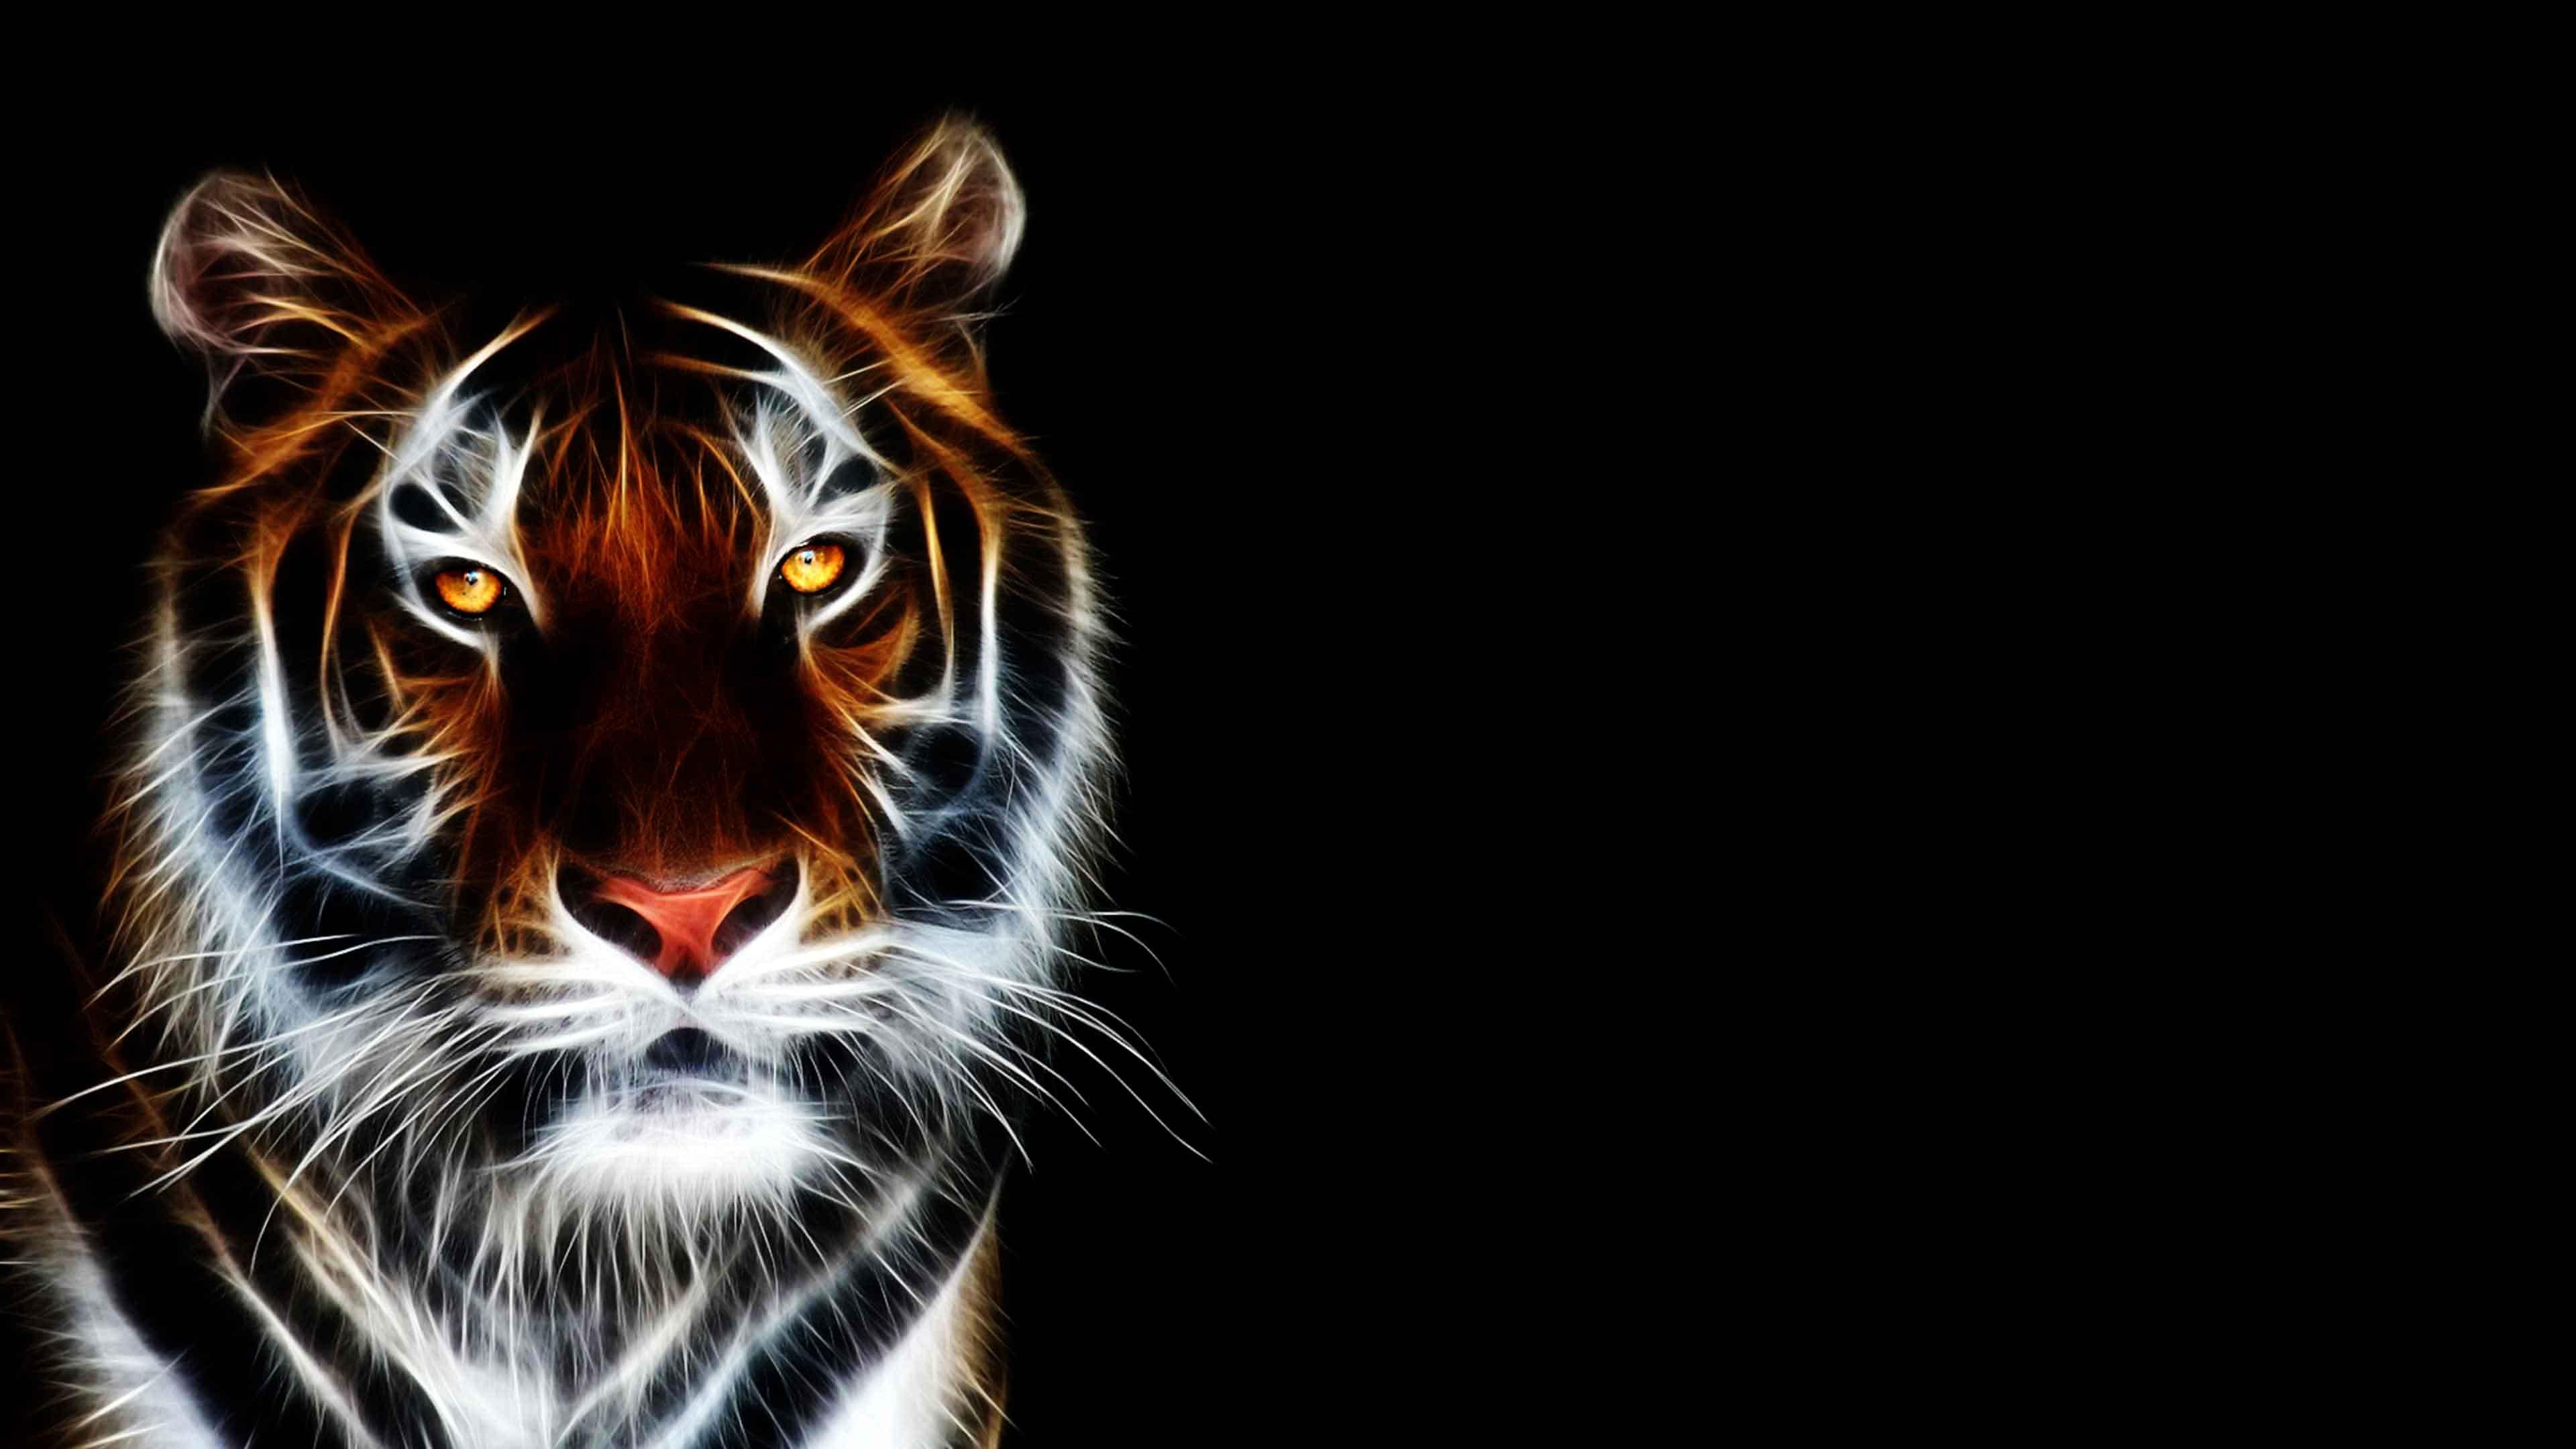 New Tiger Wallpaper 2880x1800